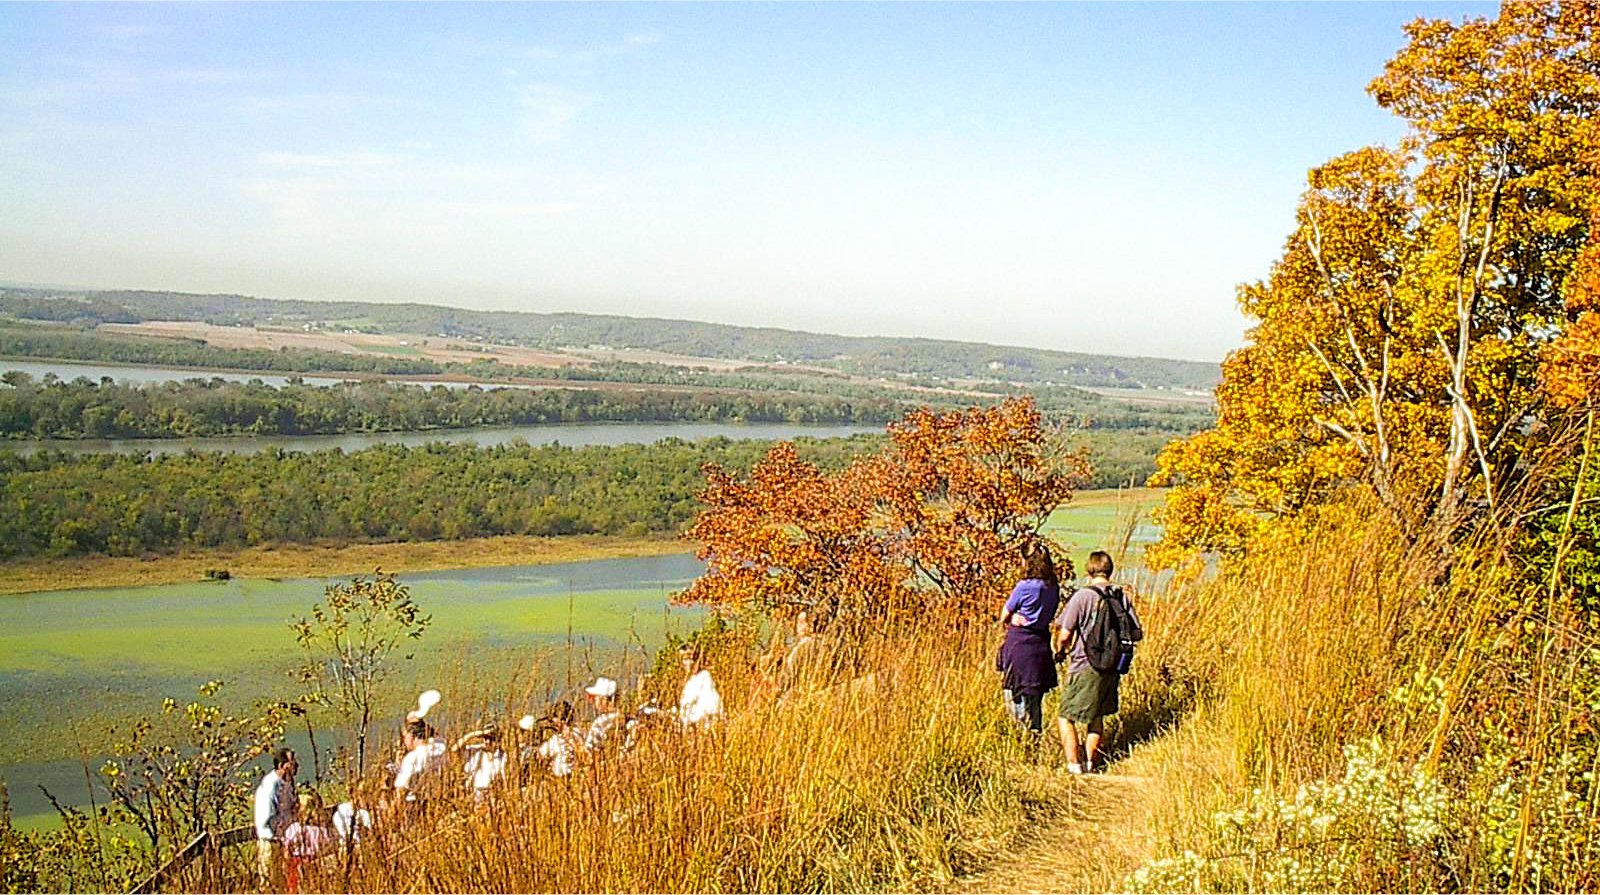 An autumn walk on the Goat Cliff Trail